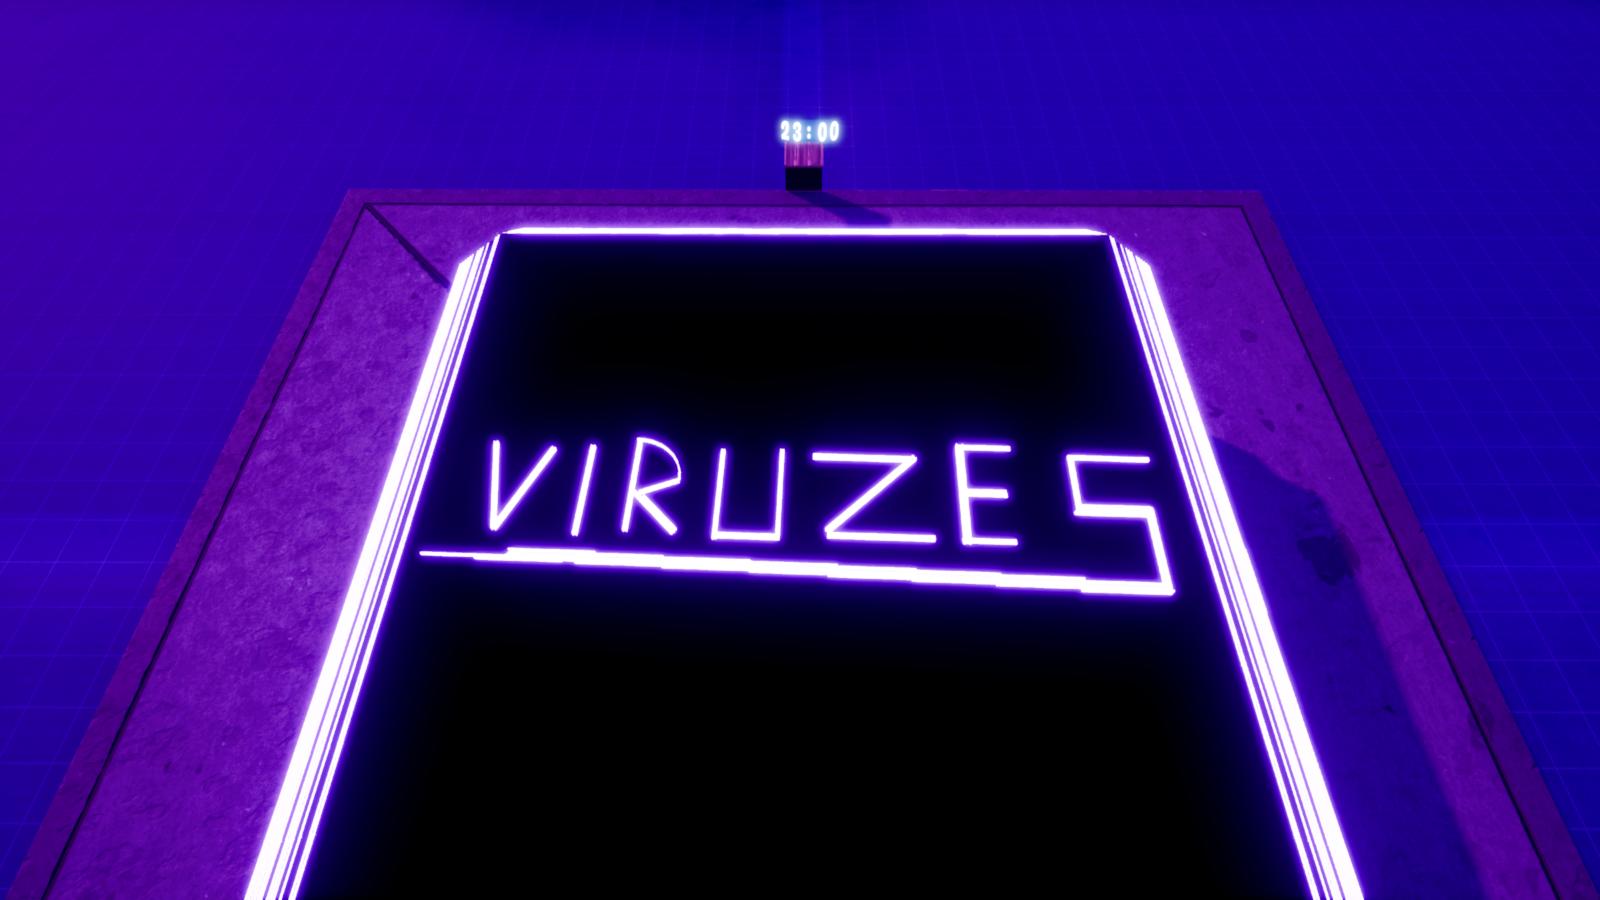 Viruzes Vz Viruz Neon Ffa Box Fights